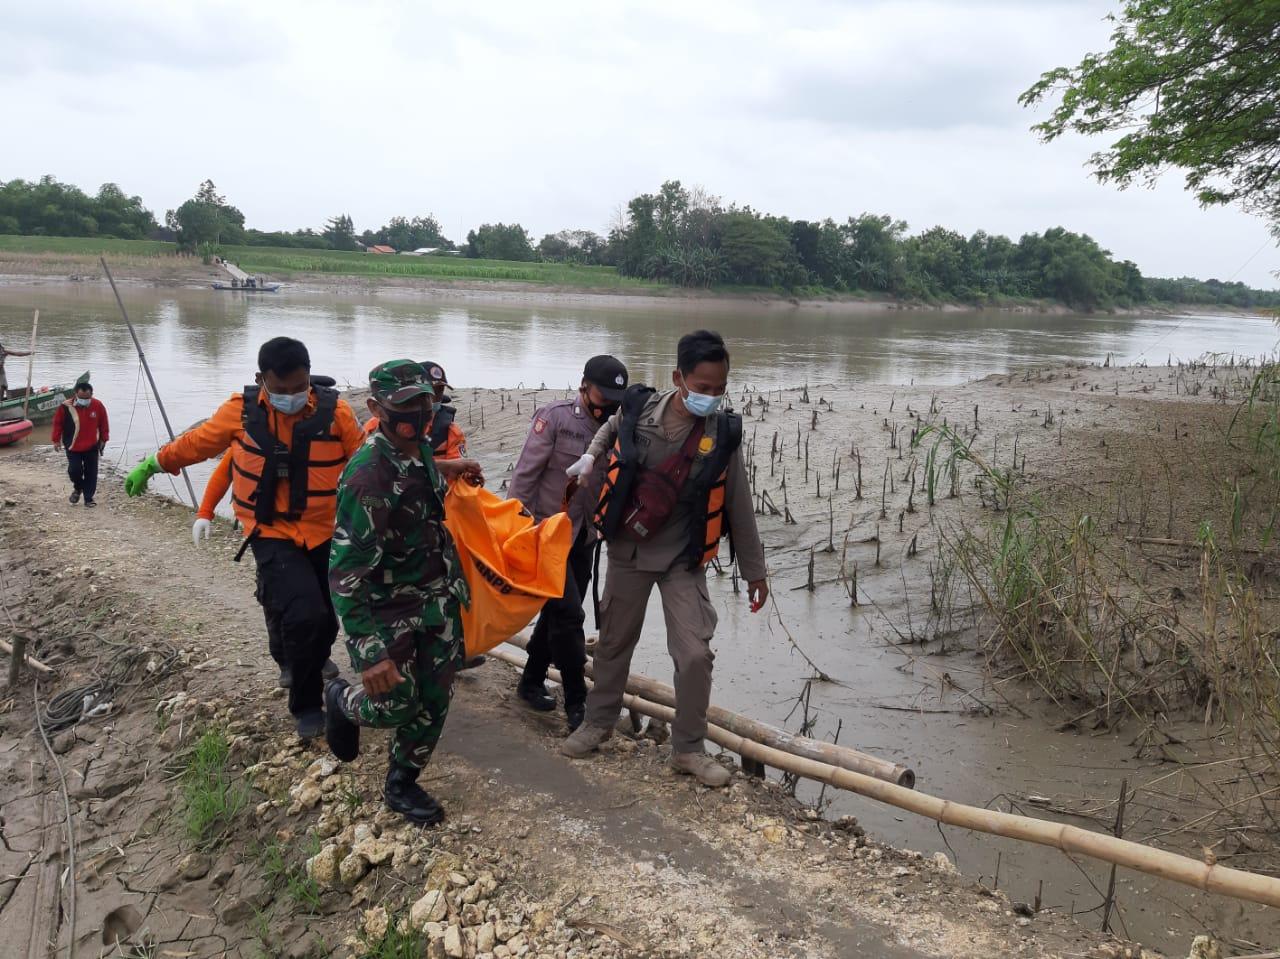 Petugas BPBD Kabupaten Tuban saat mengevakuasi korban yang terapung di Sungai Bengaawan Solo, Rabu (20/1/2021). (Foto: BPBD Tuban)